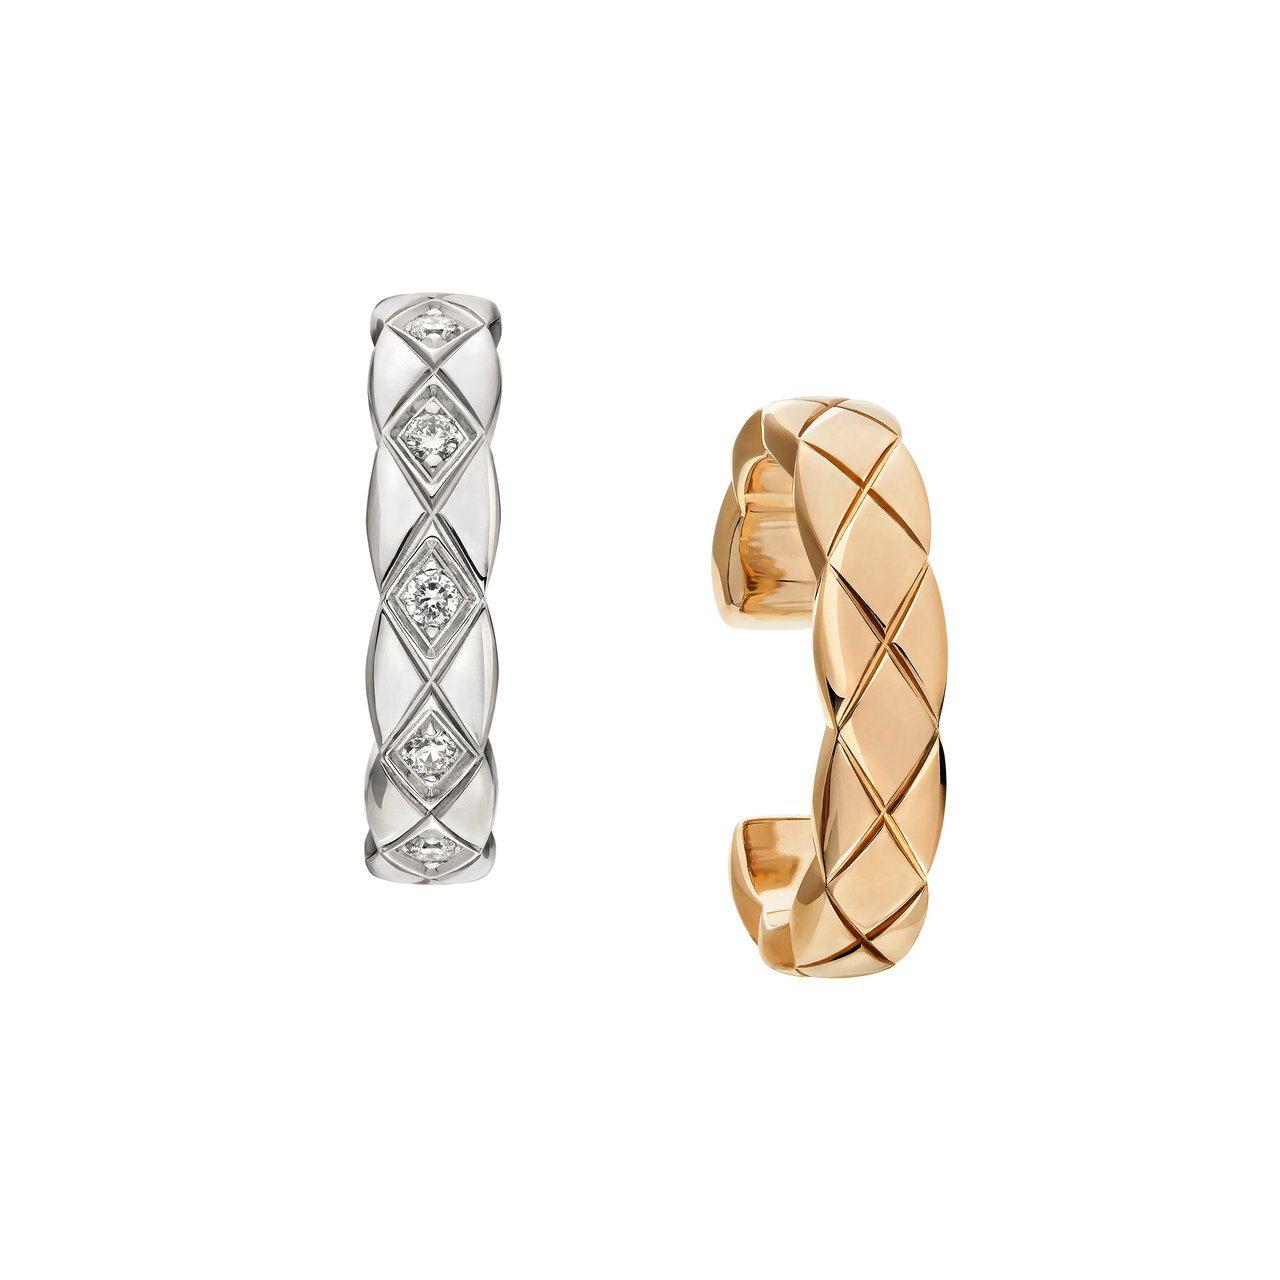 Coco Crush 18K Beige米色金與白金銬式耳骨環,92,000元。...